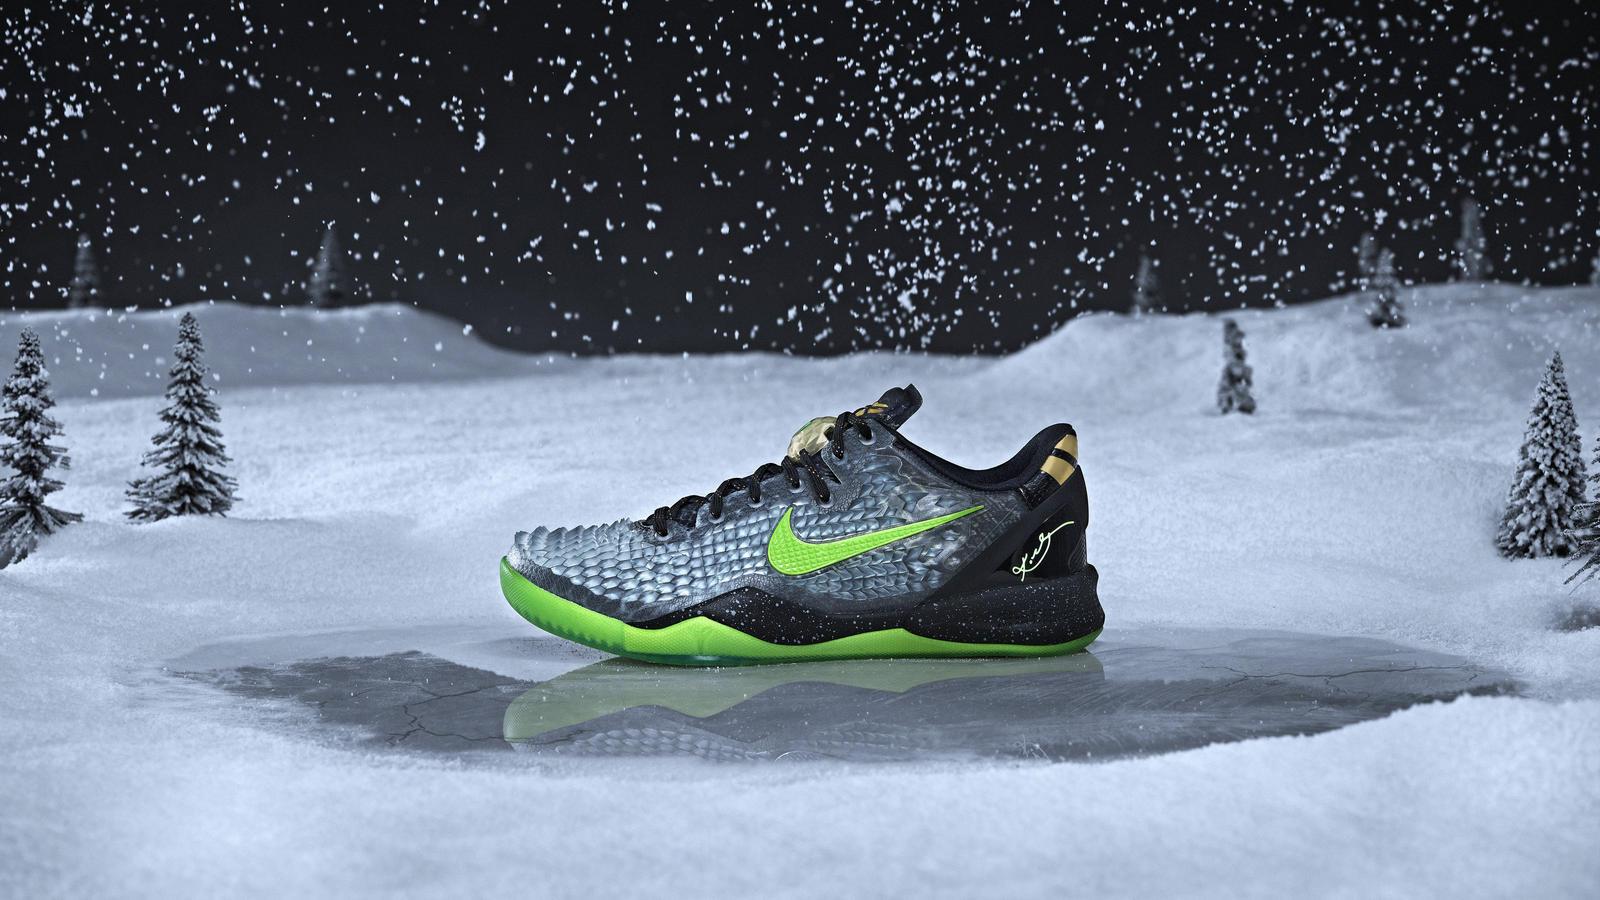 Nike Basketball Unwraps Its Annual Set of Festive Signature Footwear ...